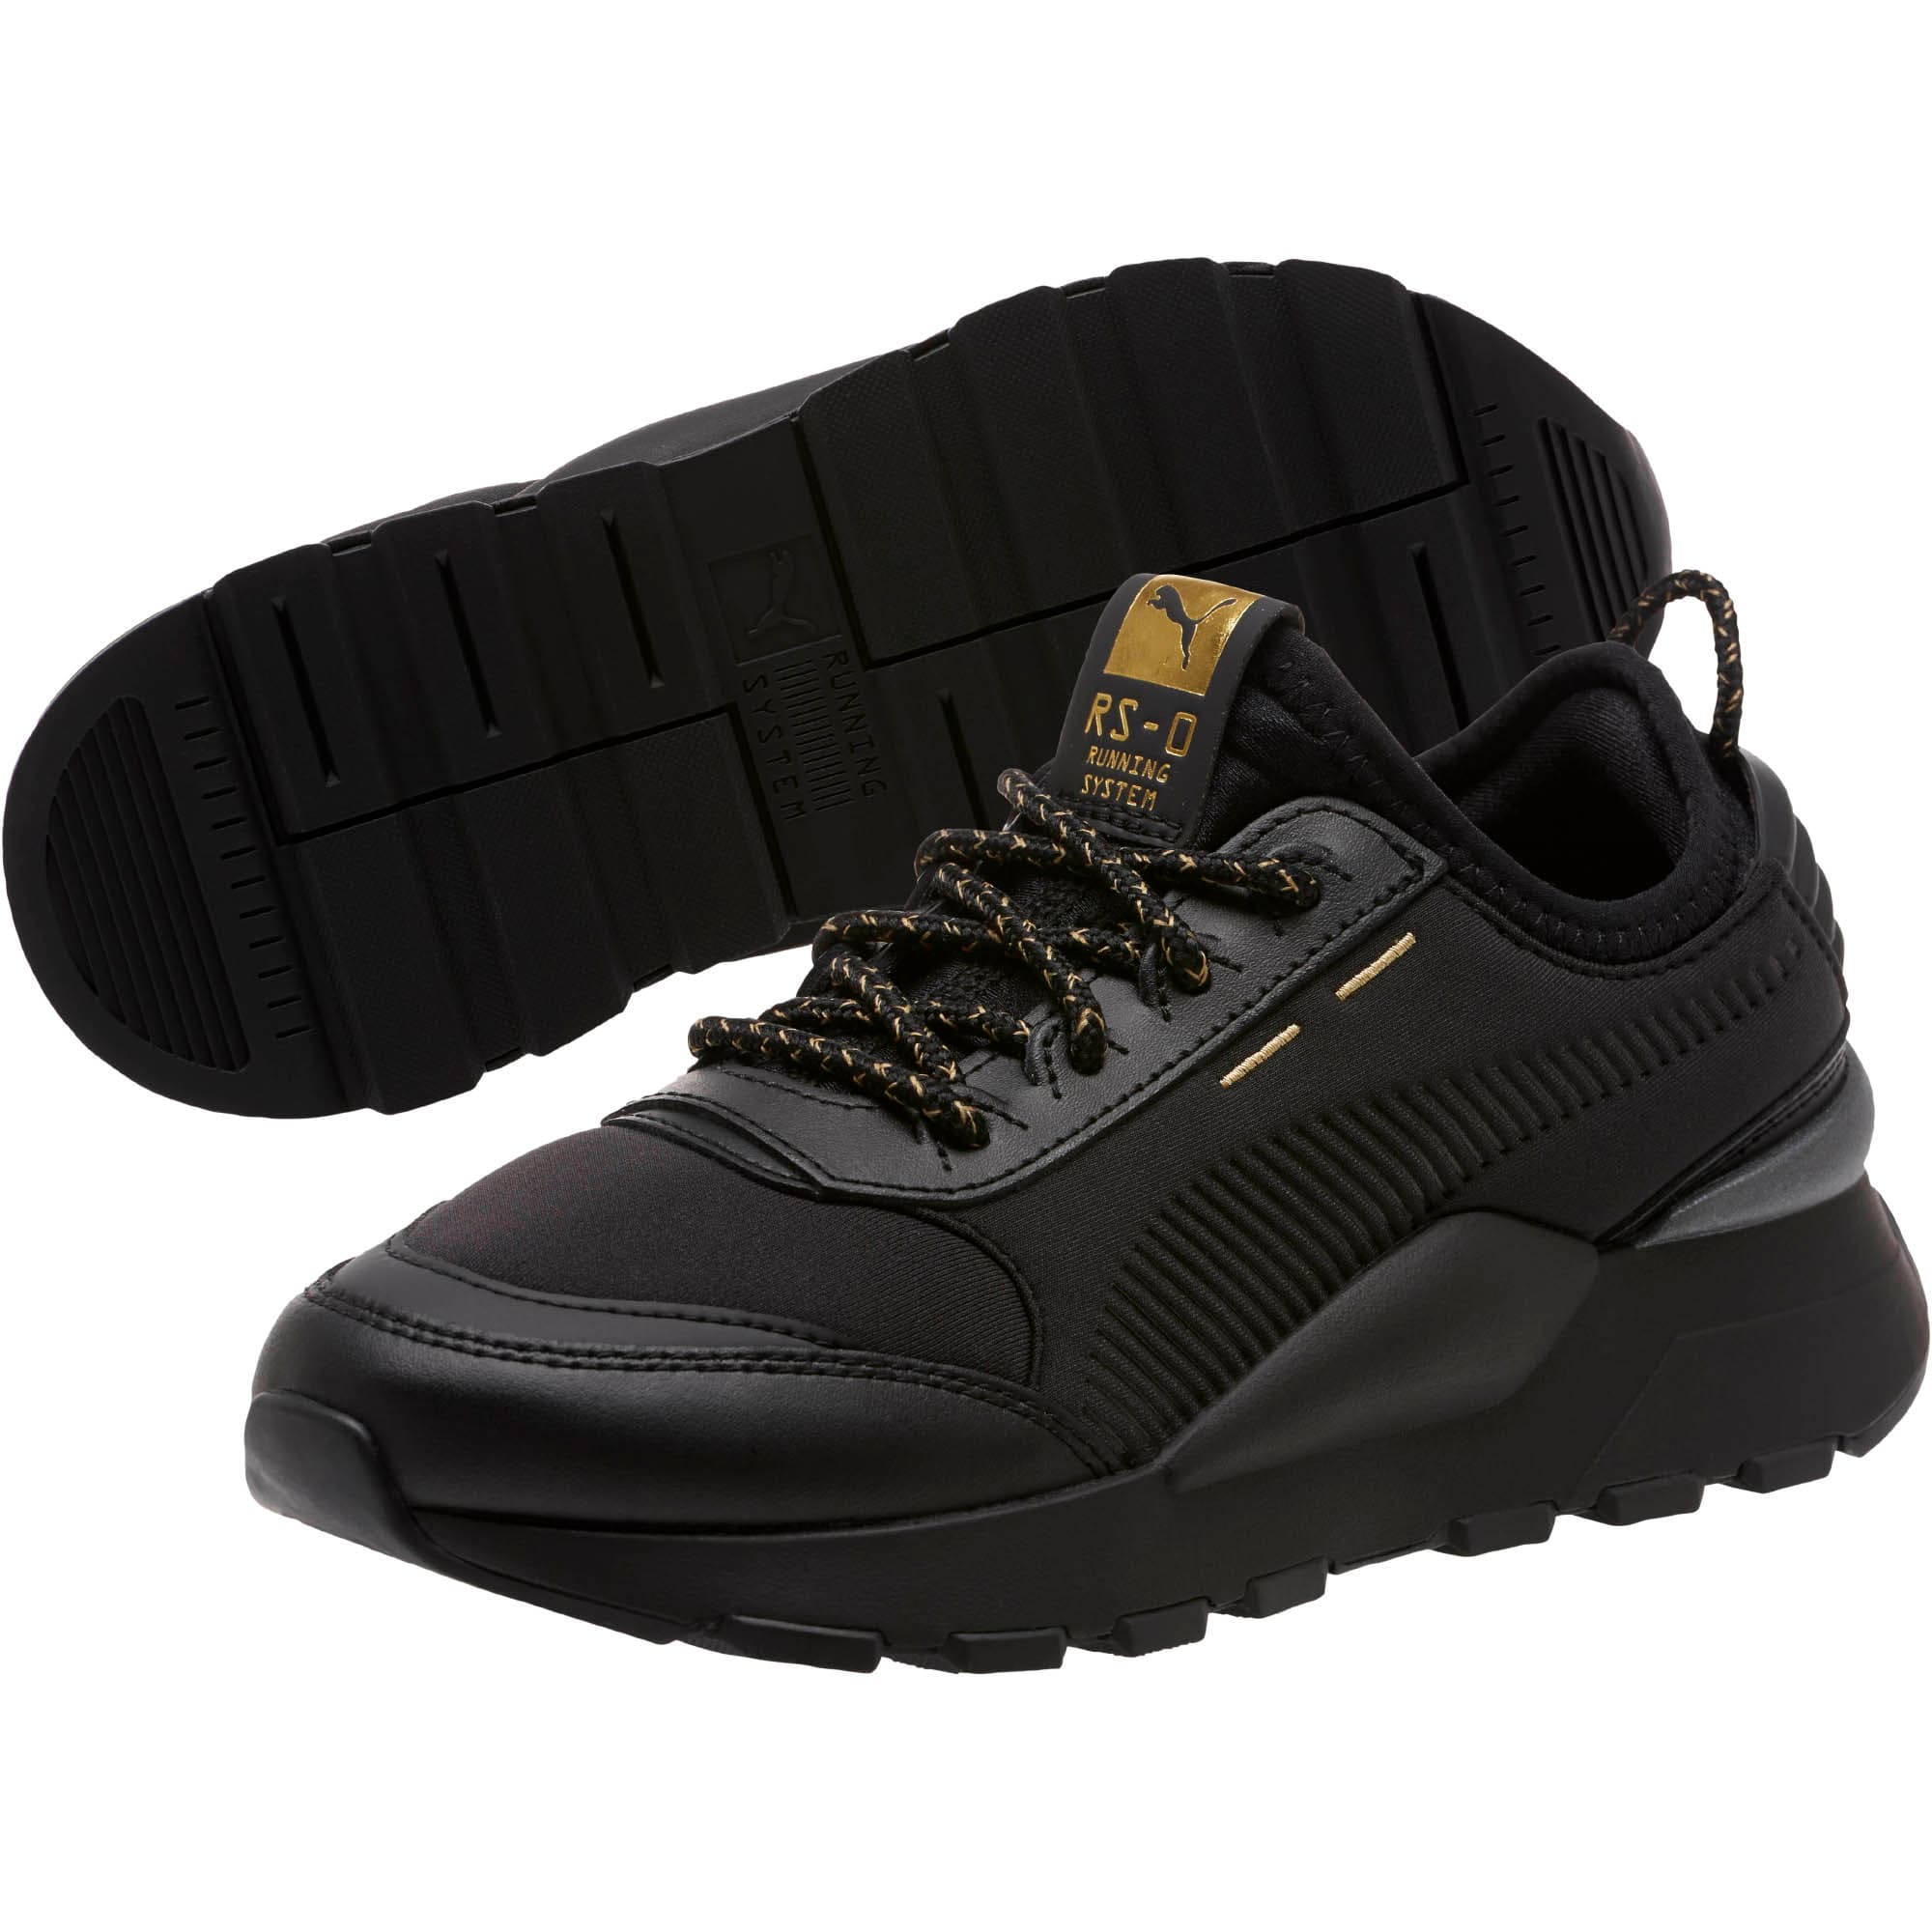 Thumbnail 2 of RS-0 Trophy Sneakers JR, Puma Black-Puma Black, medium